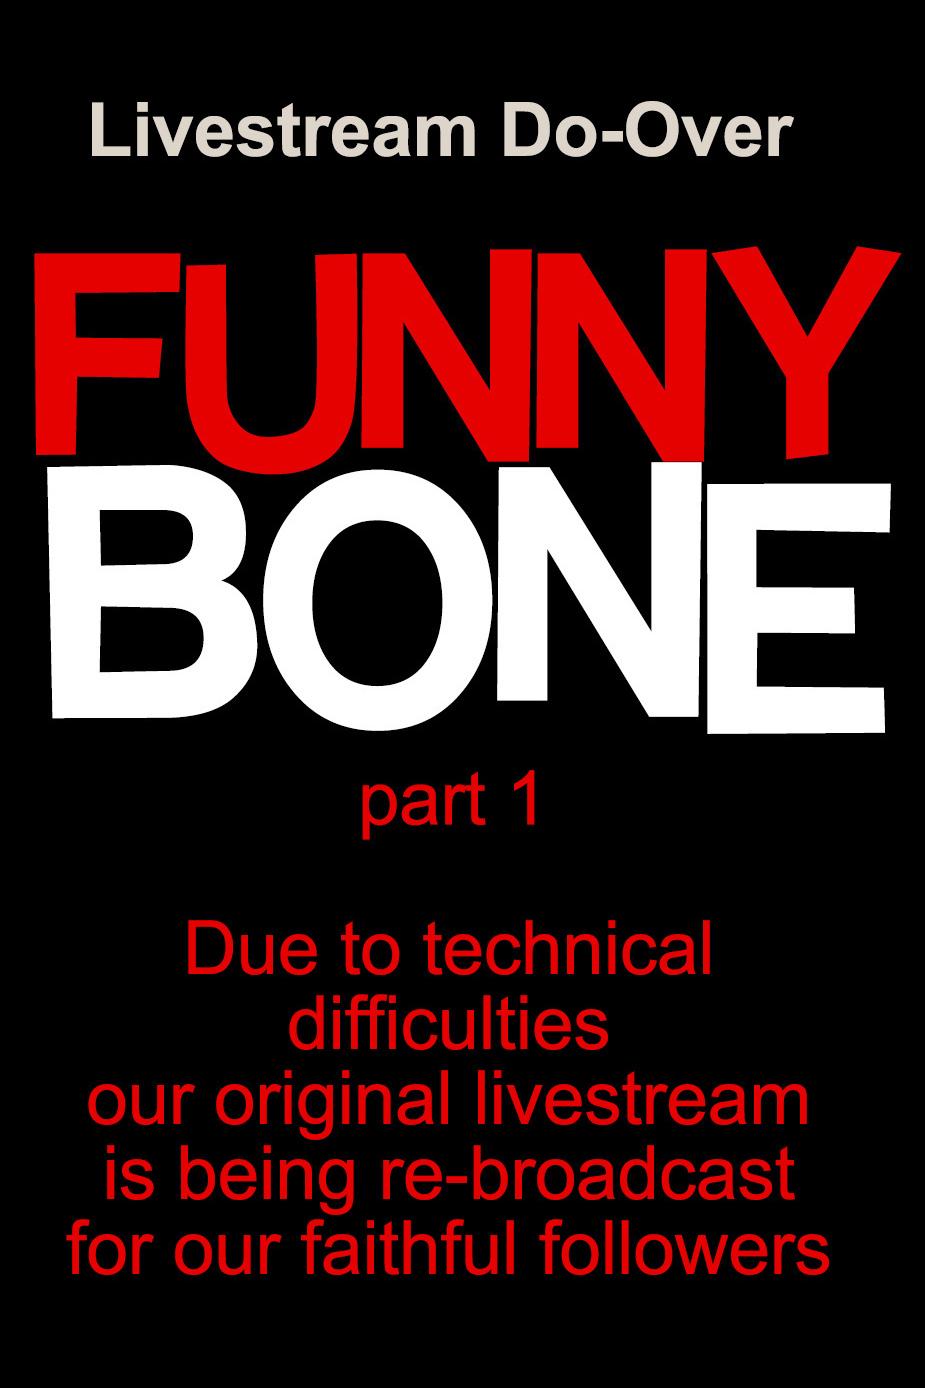 funny bone nearly live